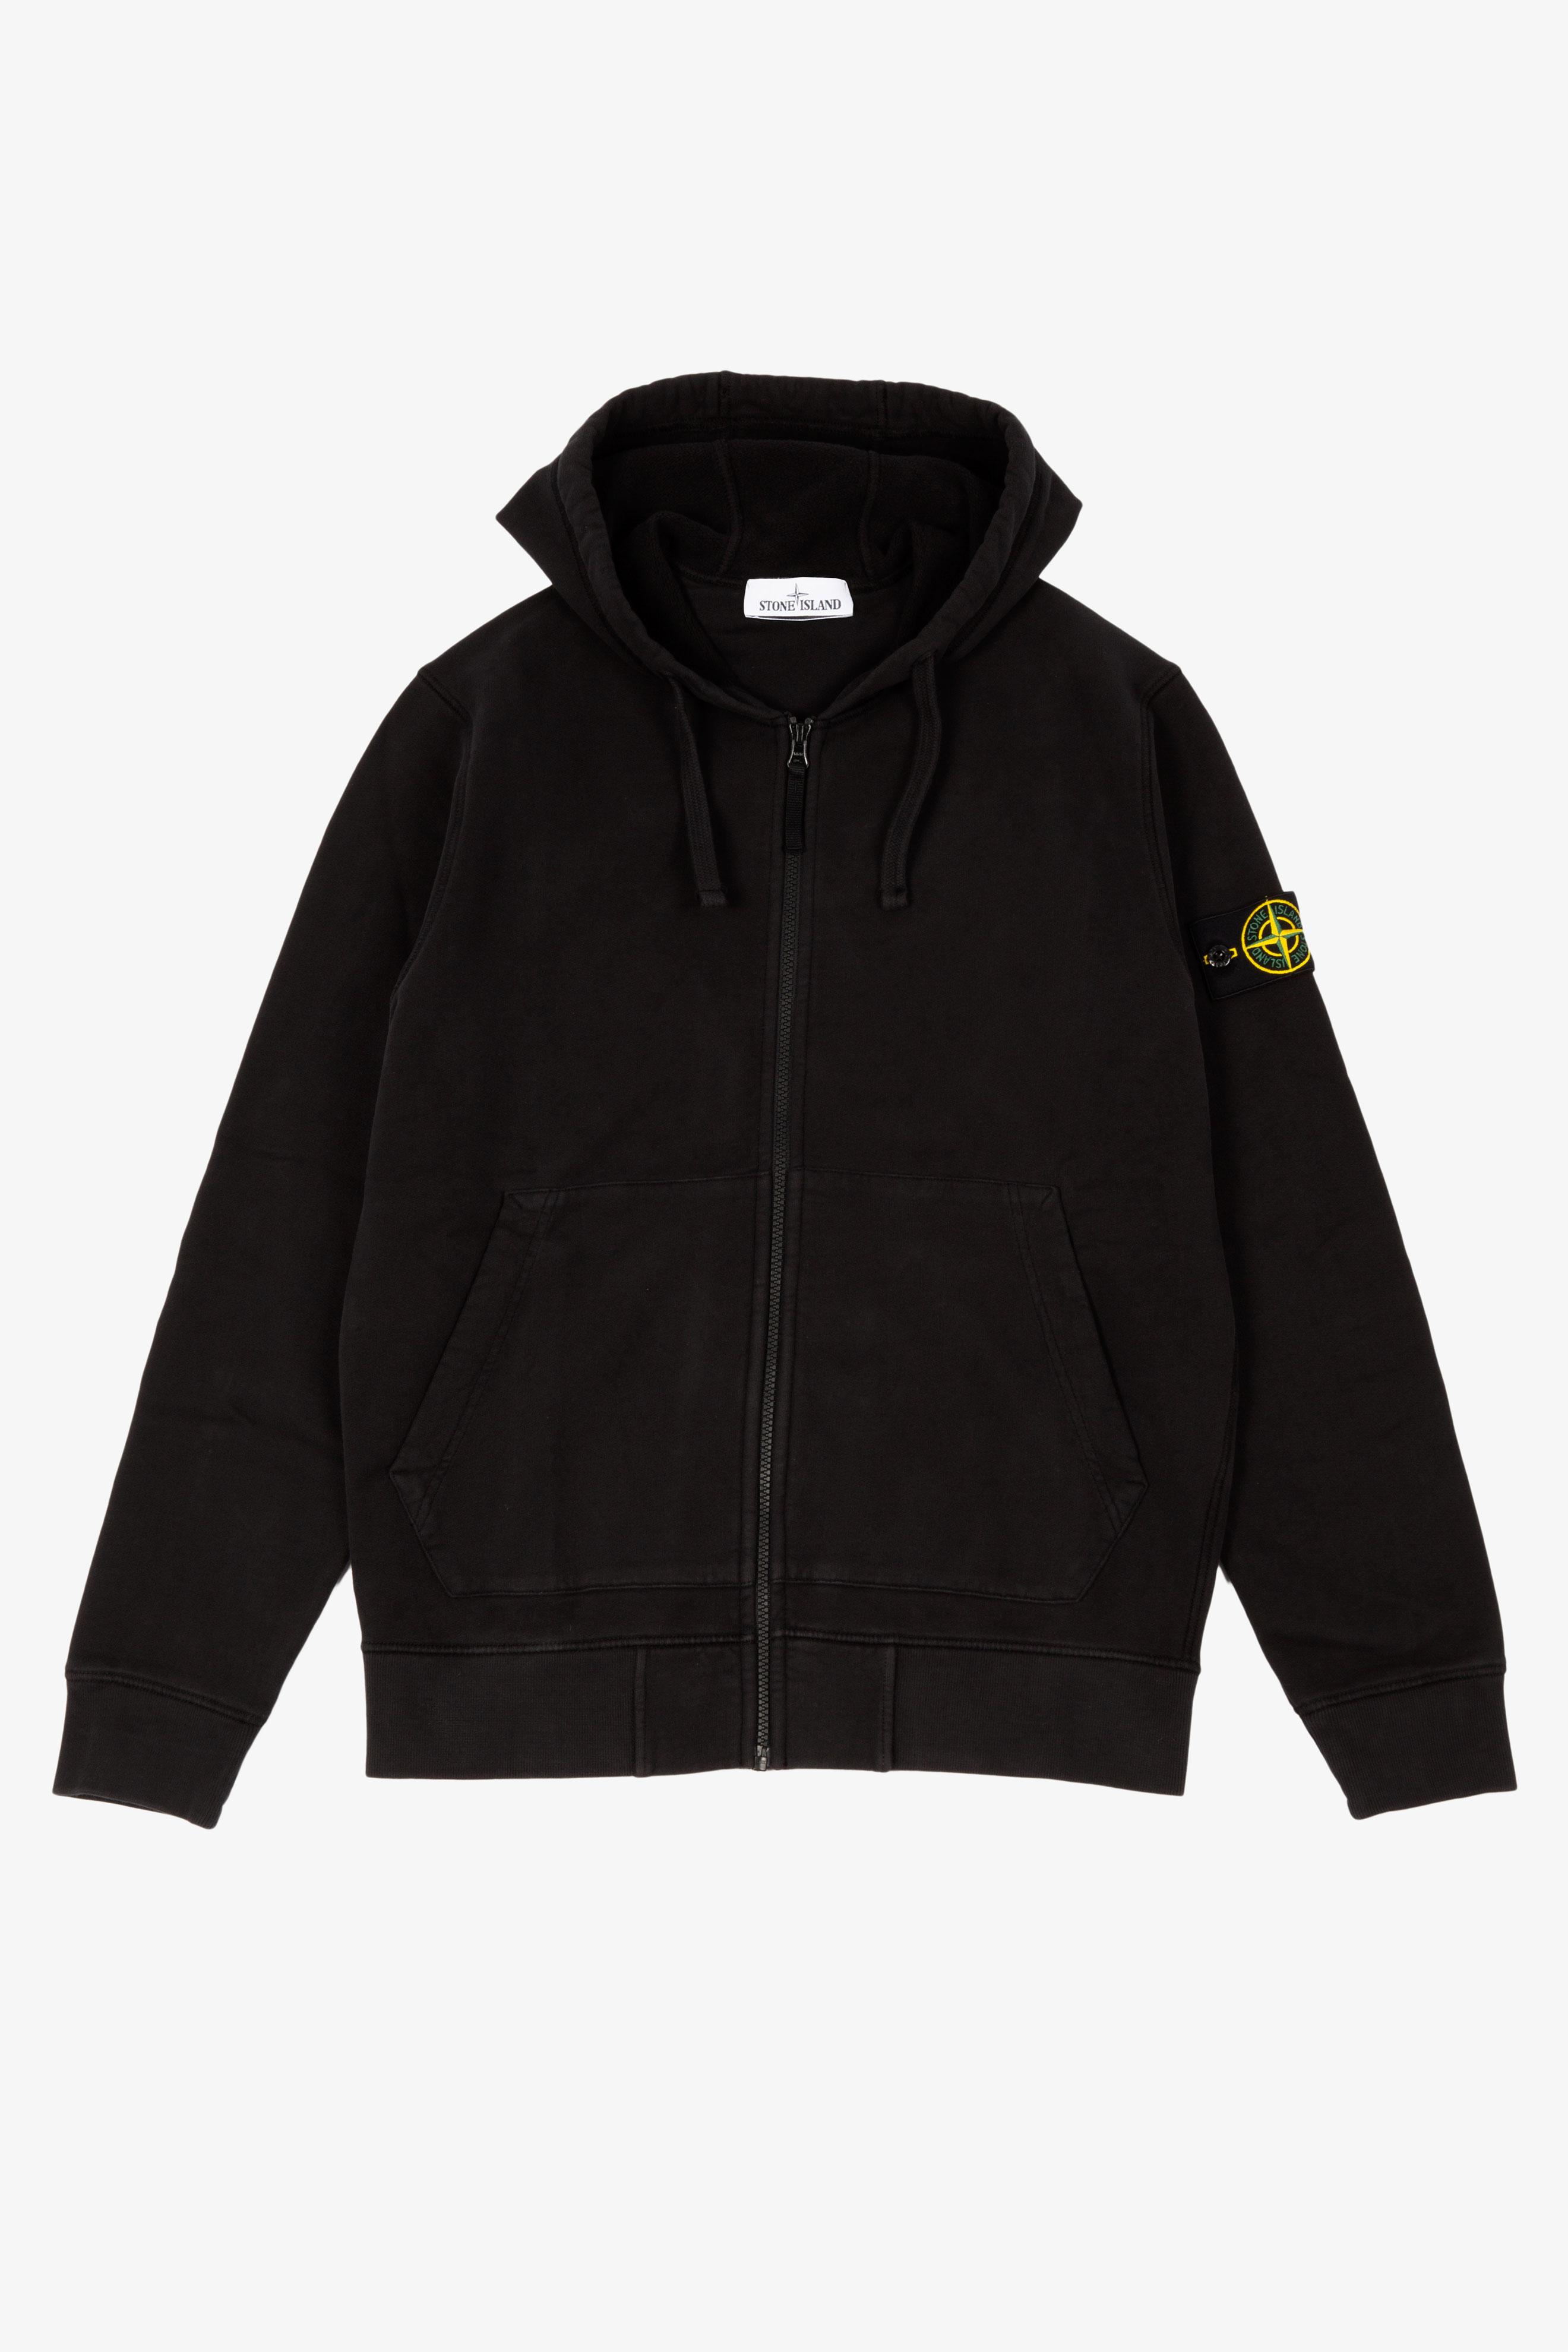 Zip Hooded Sweatshirt Black